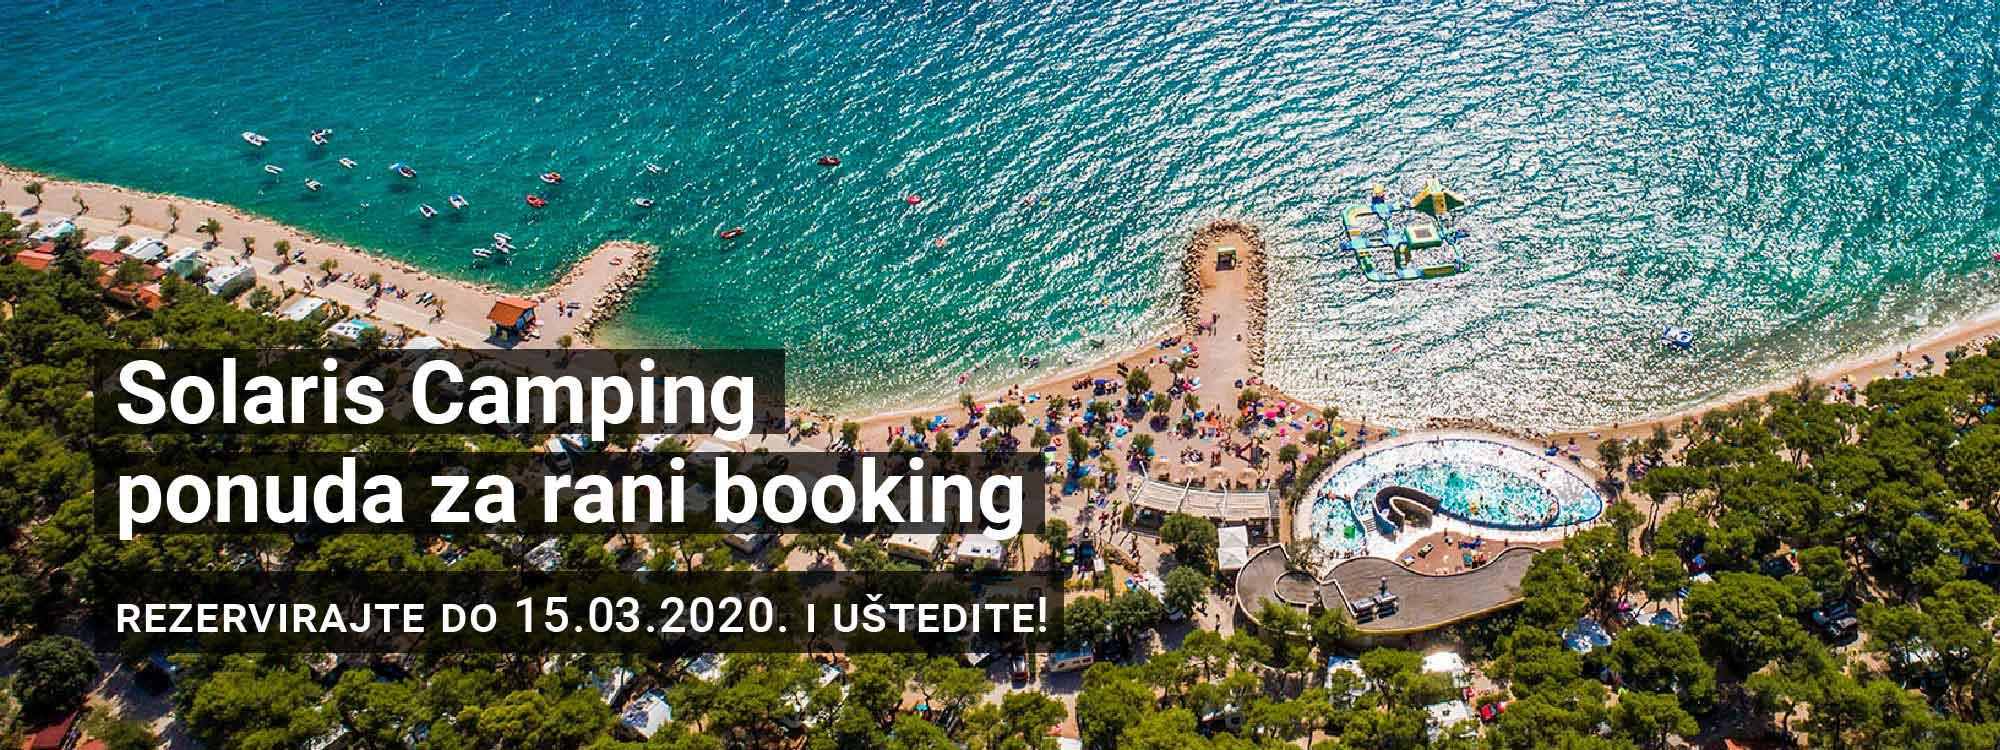 Web-slider-Rani-booking-kamp-2020-02-HRV